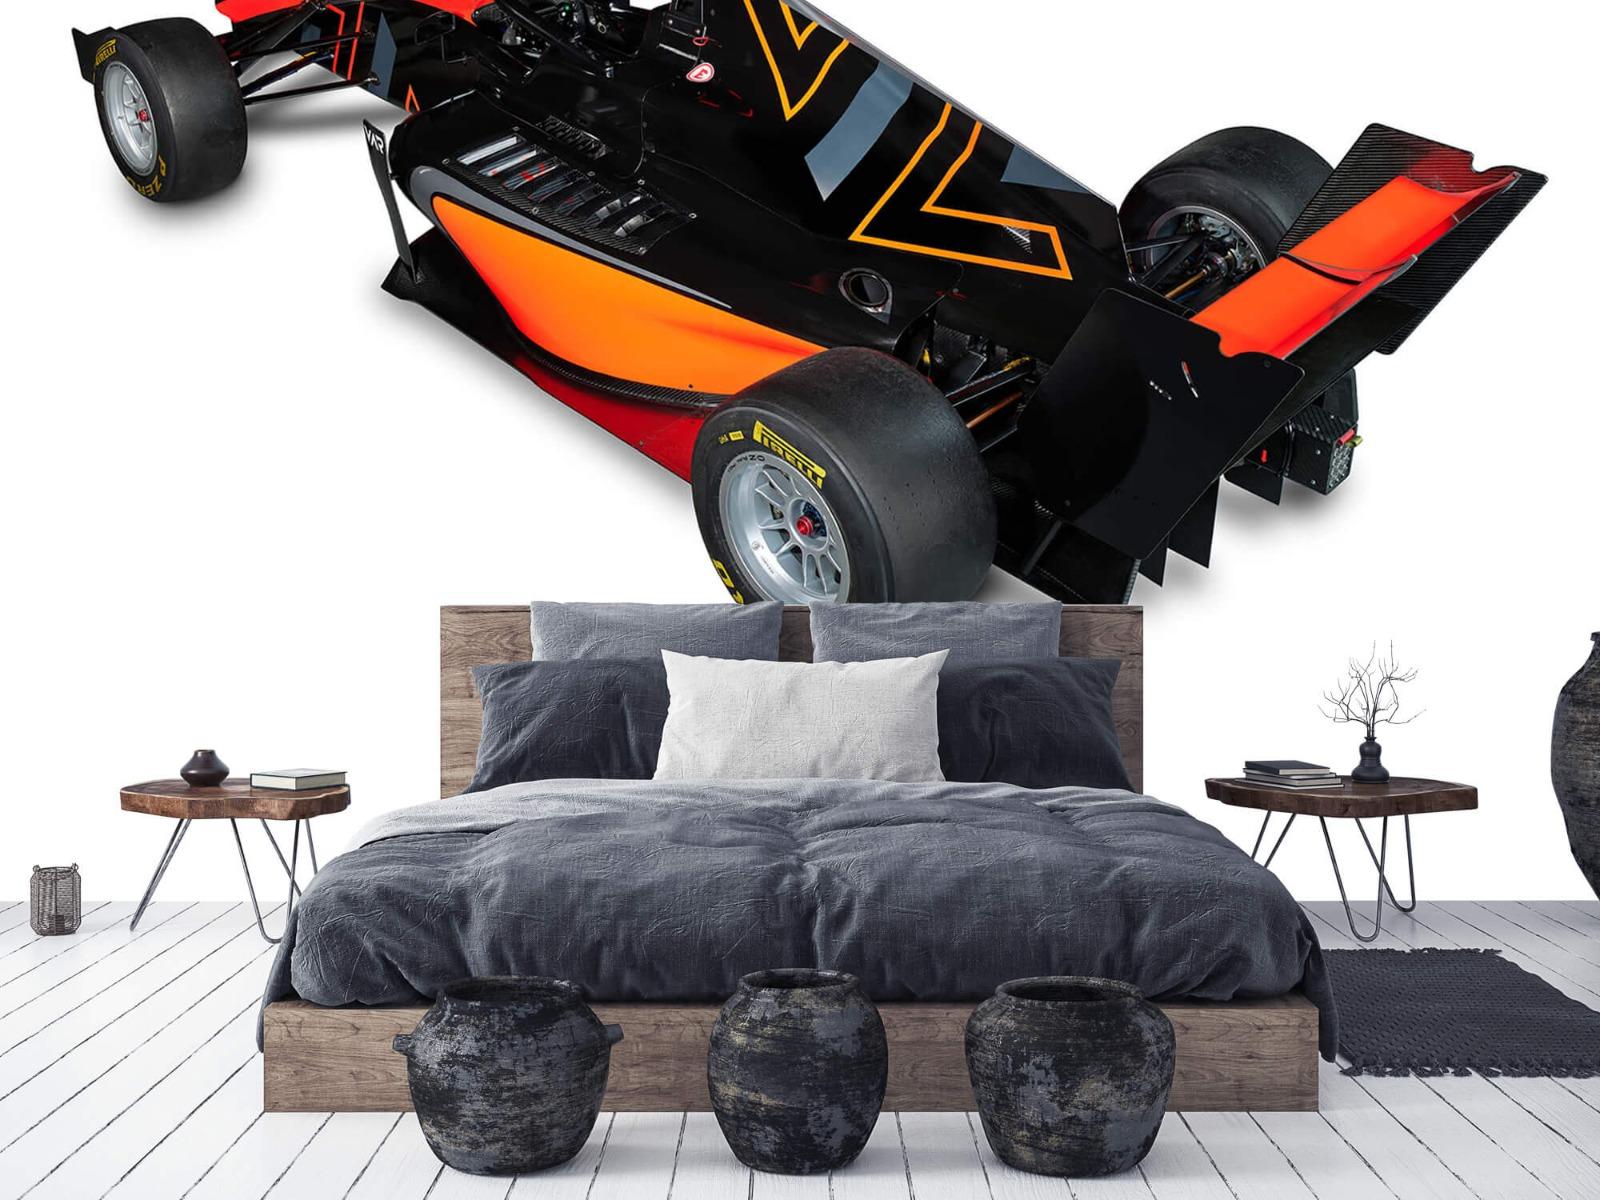 Sportauto's - Formula 3 - Rear left view - Hobbykamer 6